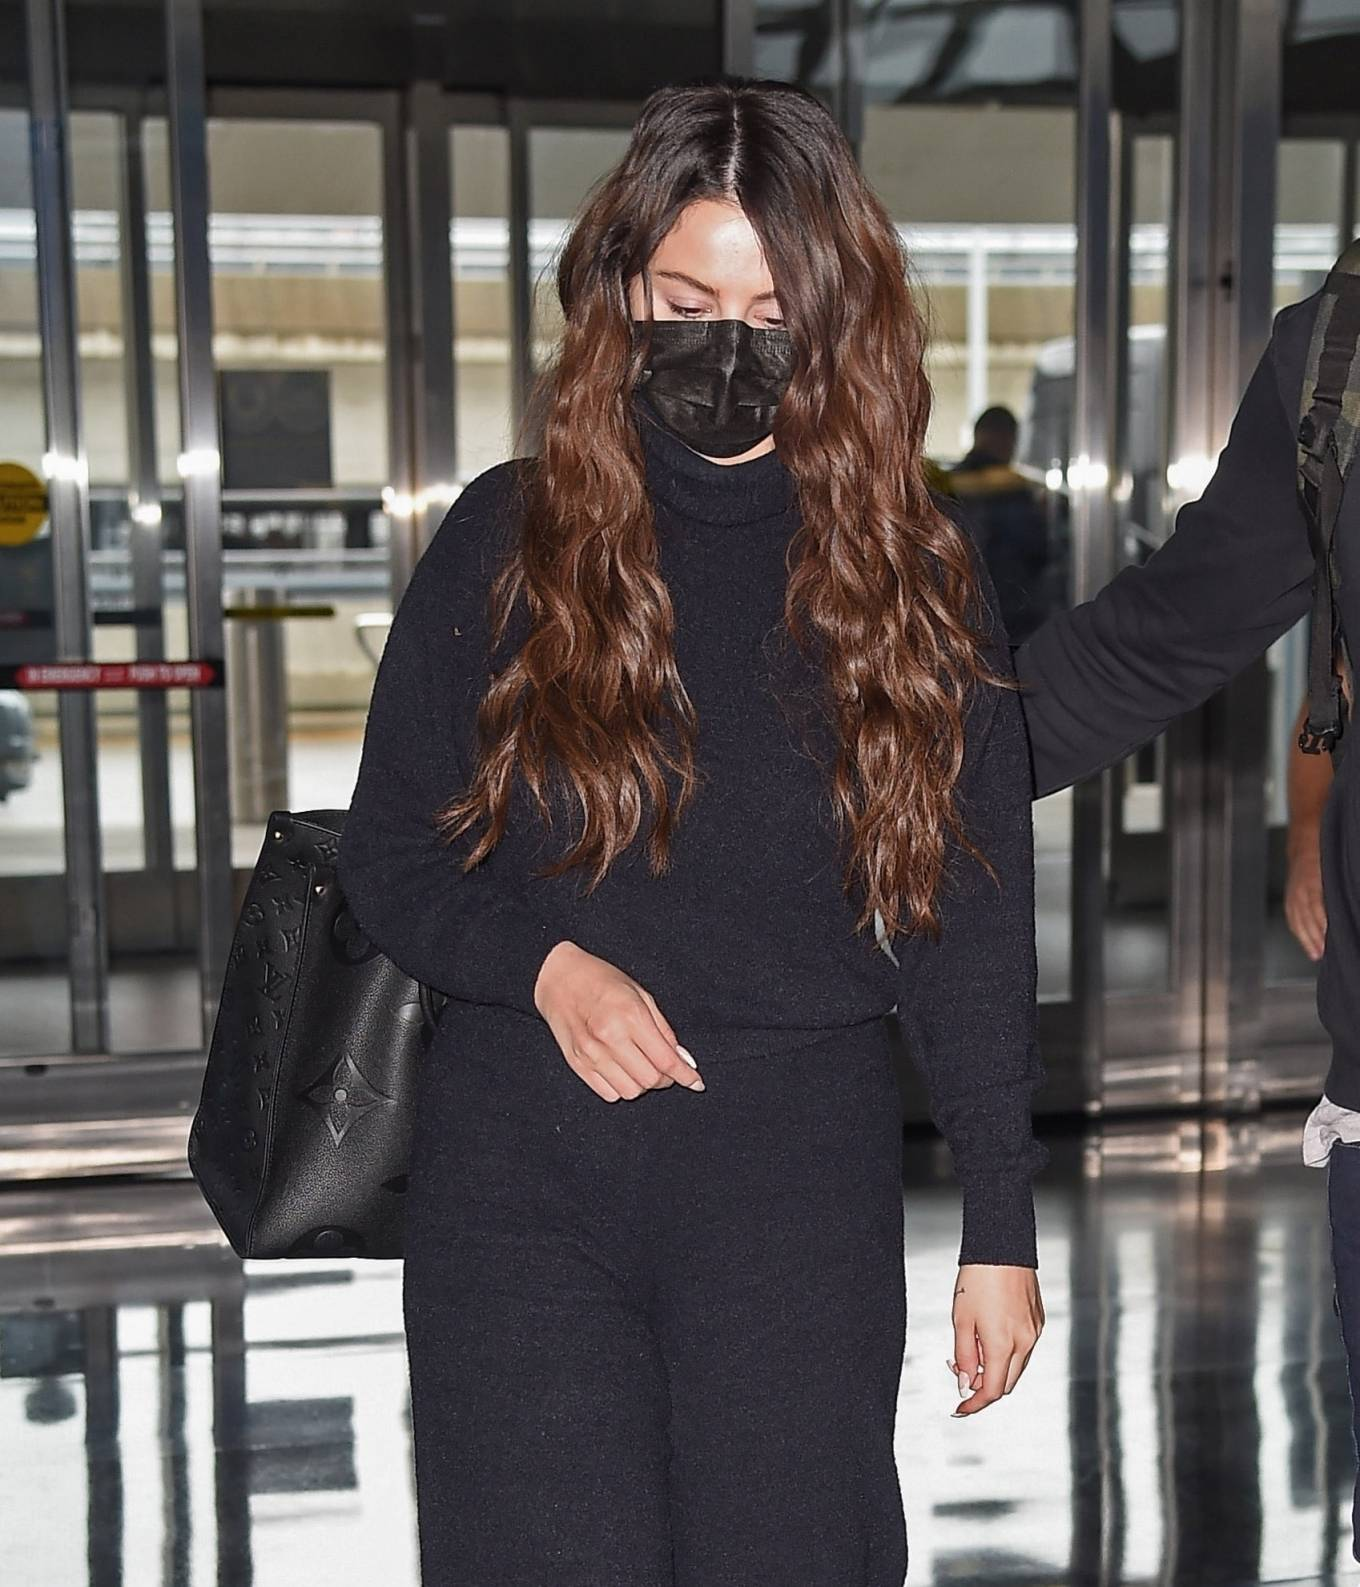 Selena Gomez wearing brand logo white Prada lace-up sneakers